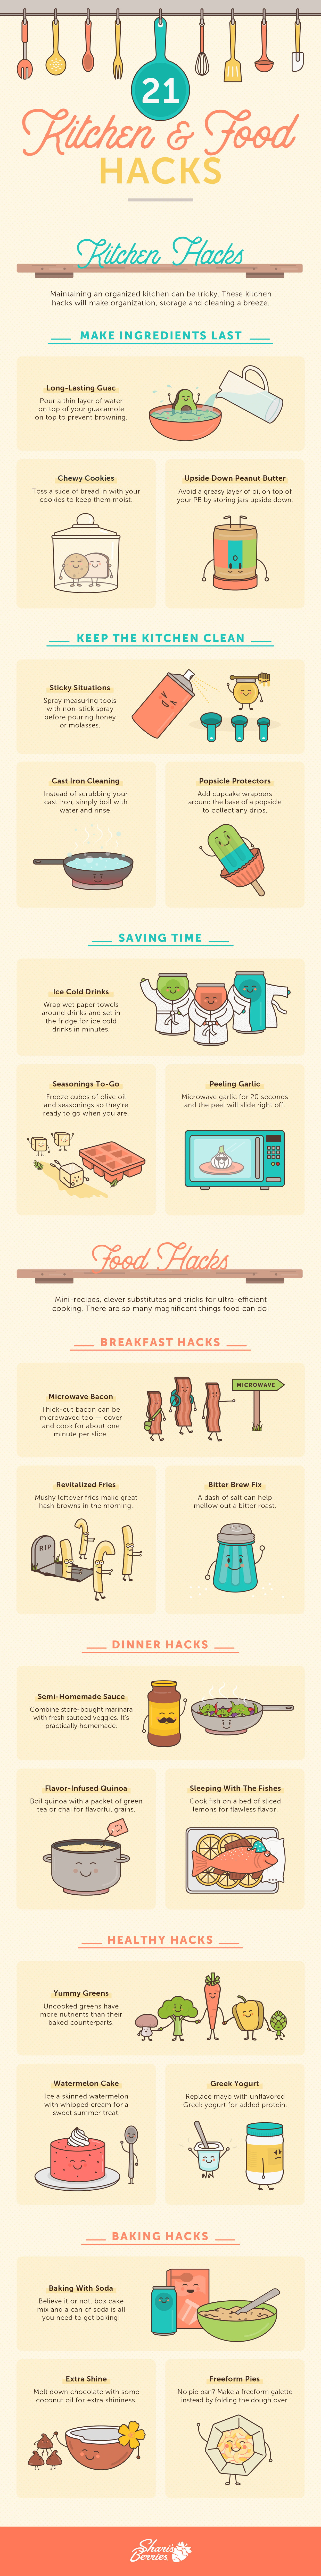 food and kitchen hacks